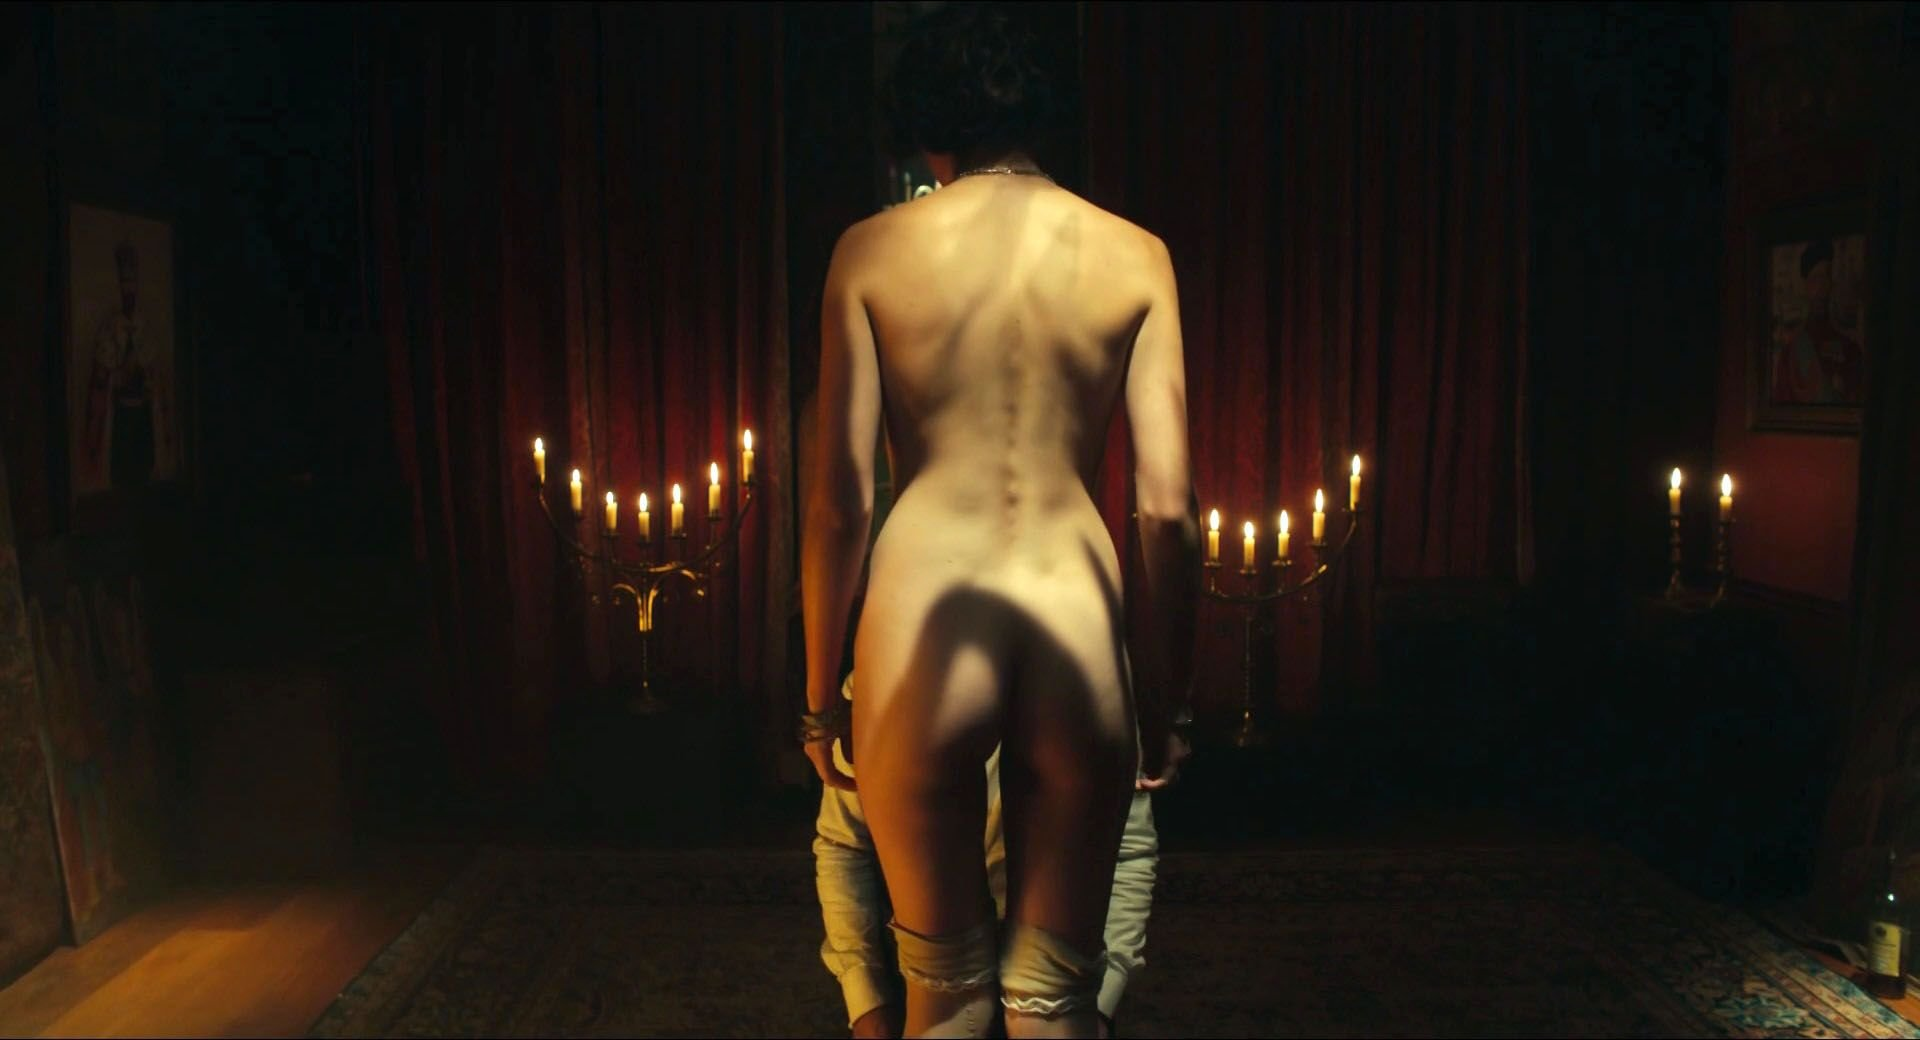 Gaite jansen naked